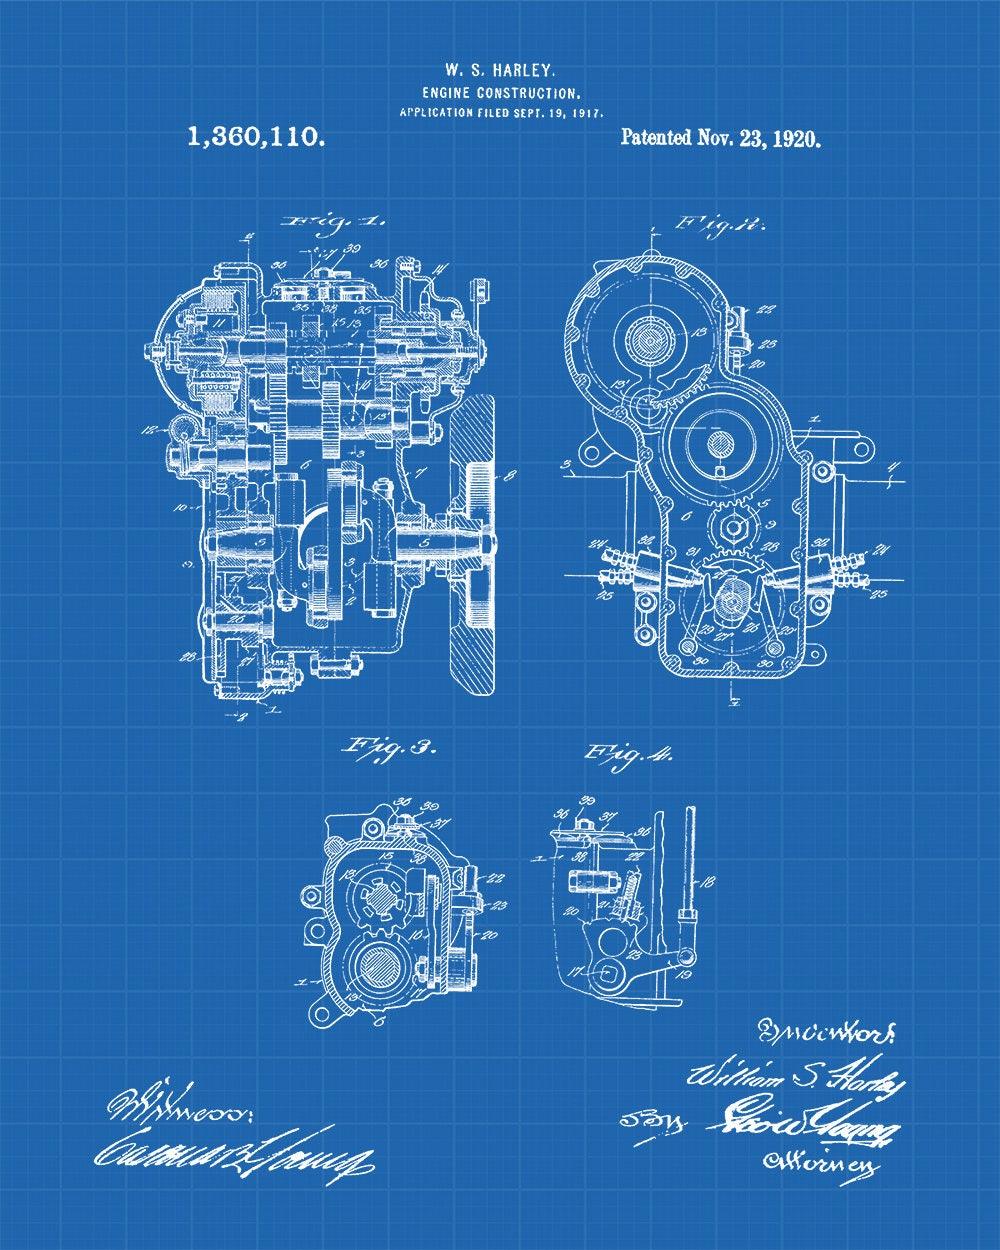 Harley Engine Construction Patent Art Print Davidson Diagram Motorcycle